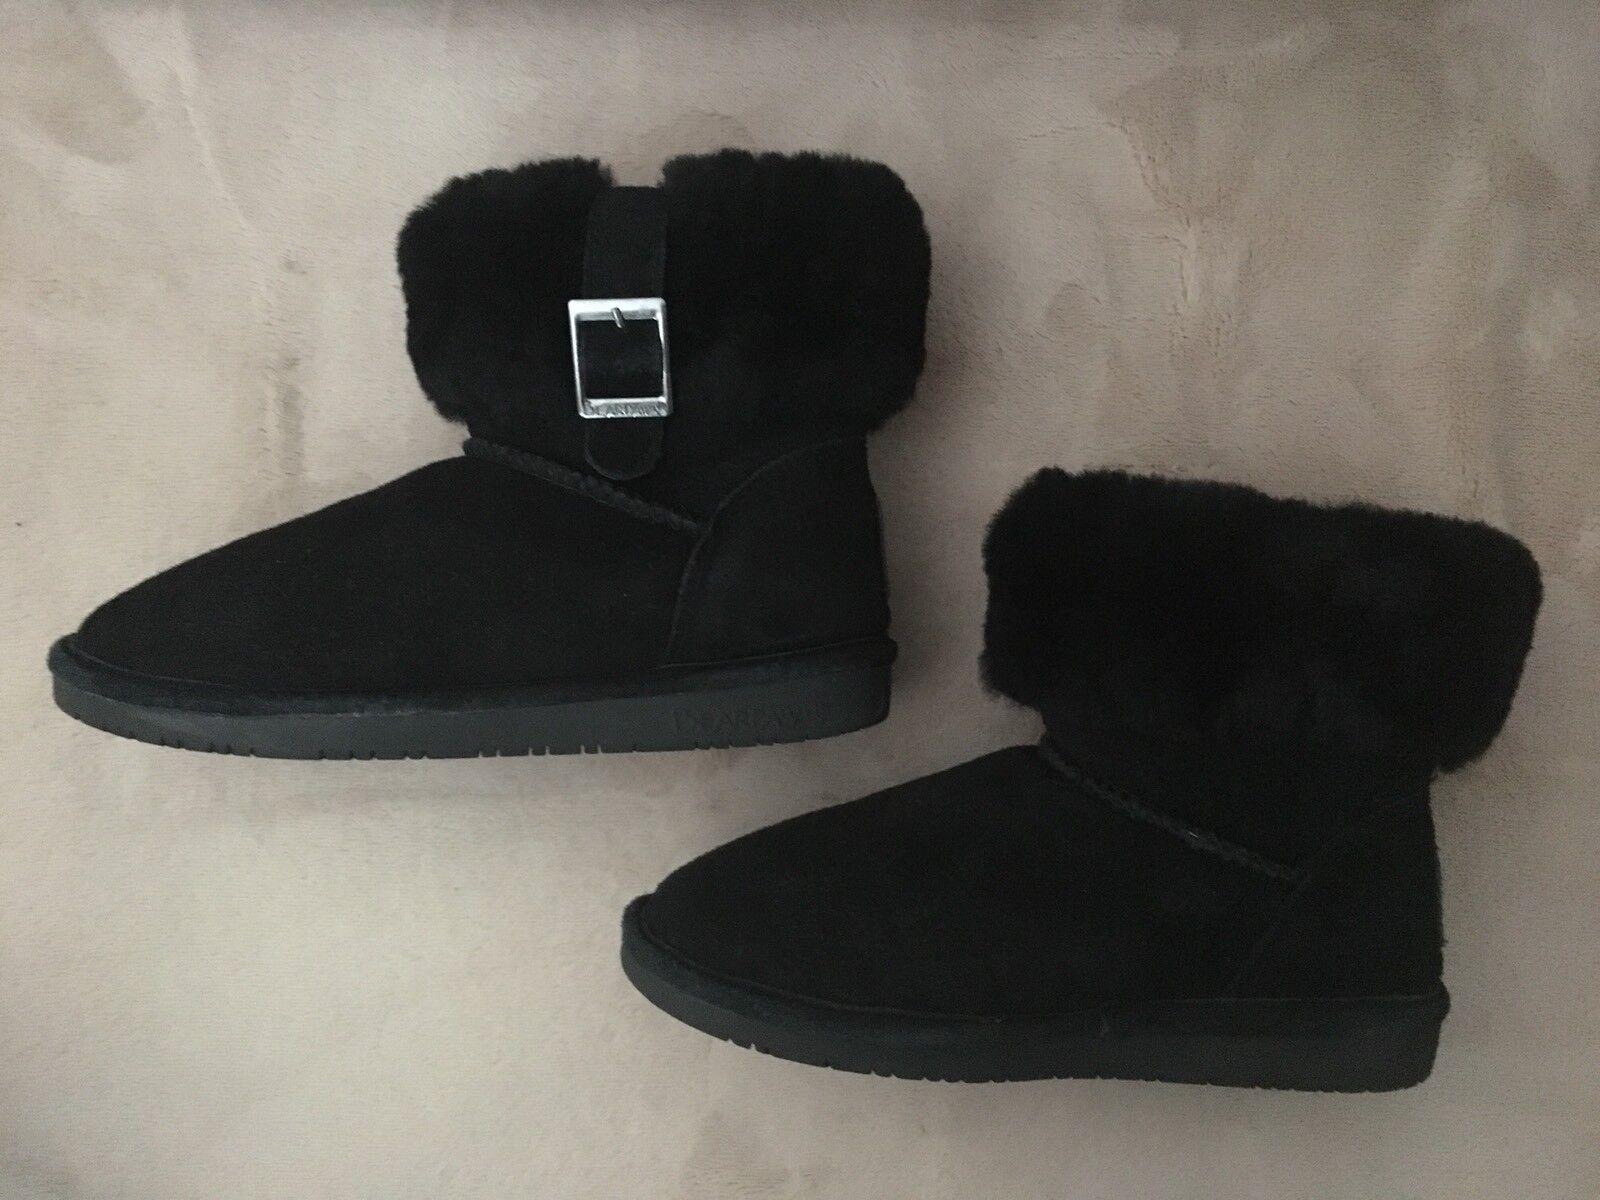 Bearpaw Bearpaw Bearpaw Boots Abby Black With Box Sz 6 ed7971